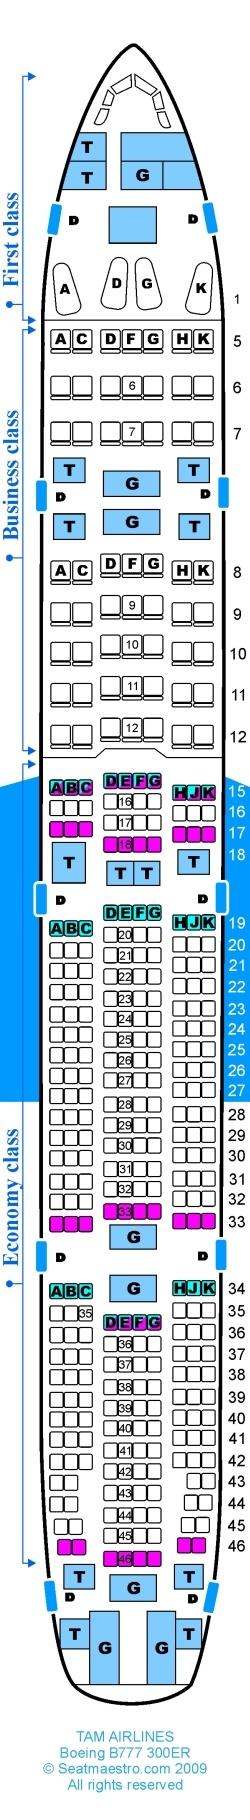 TAM Airlines - Boeing B777 300ER Mapa de asientos